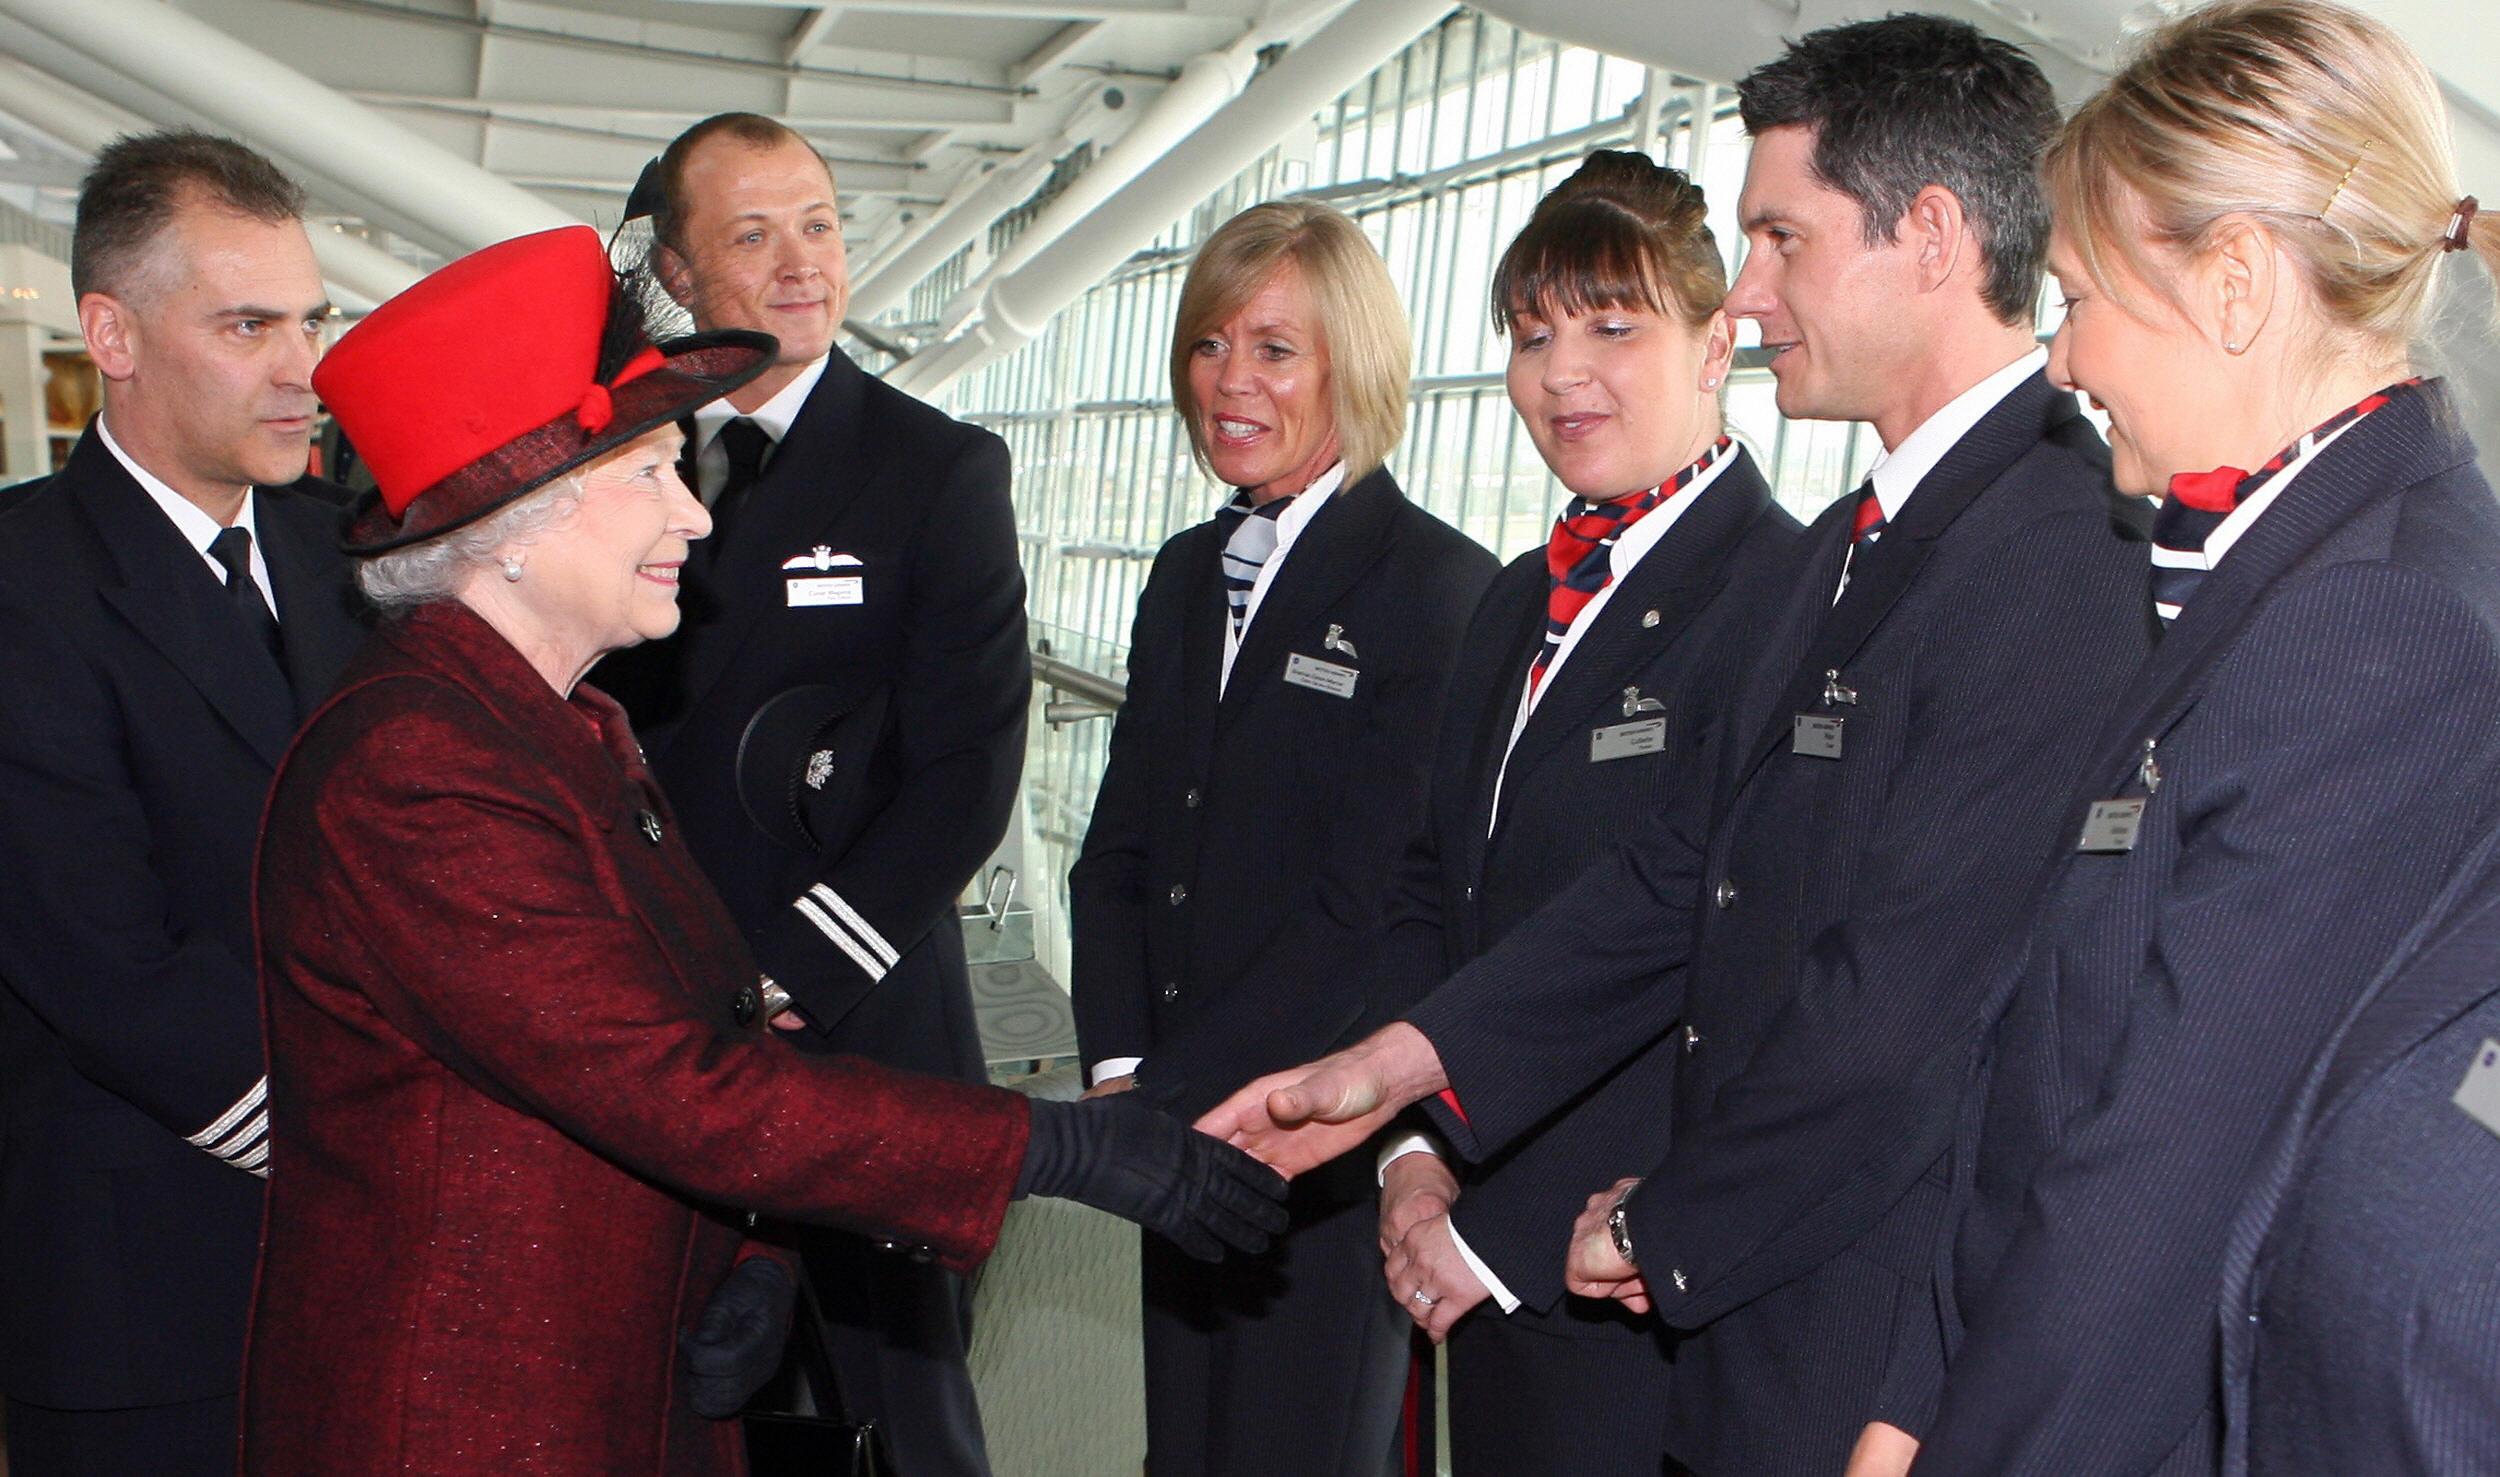 Queen Elizabeth meets with employees of British Airways